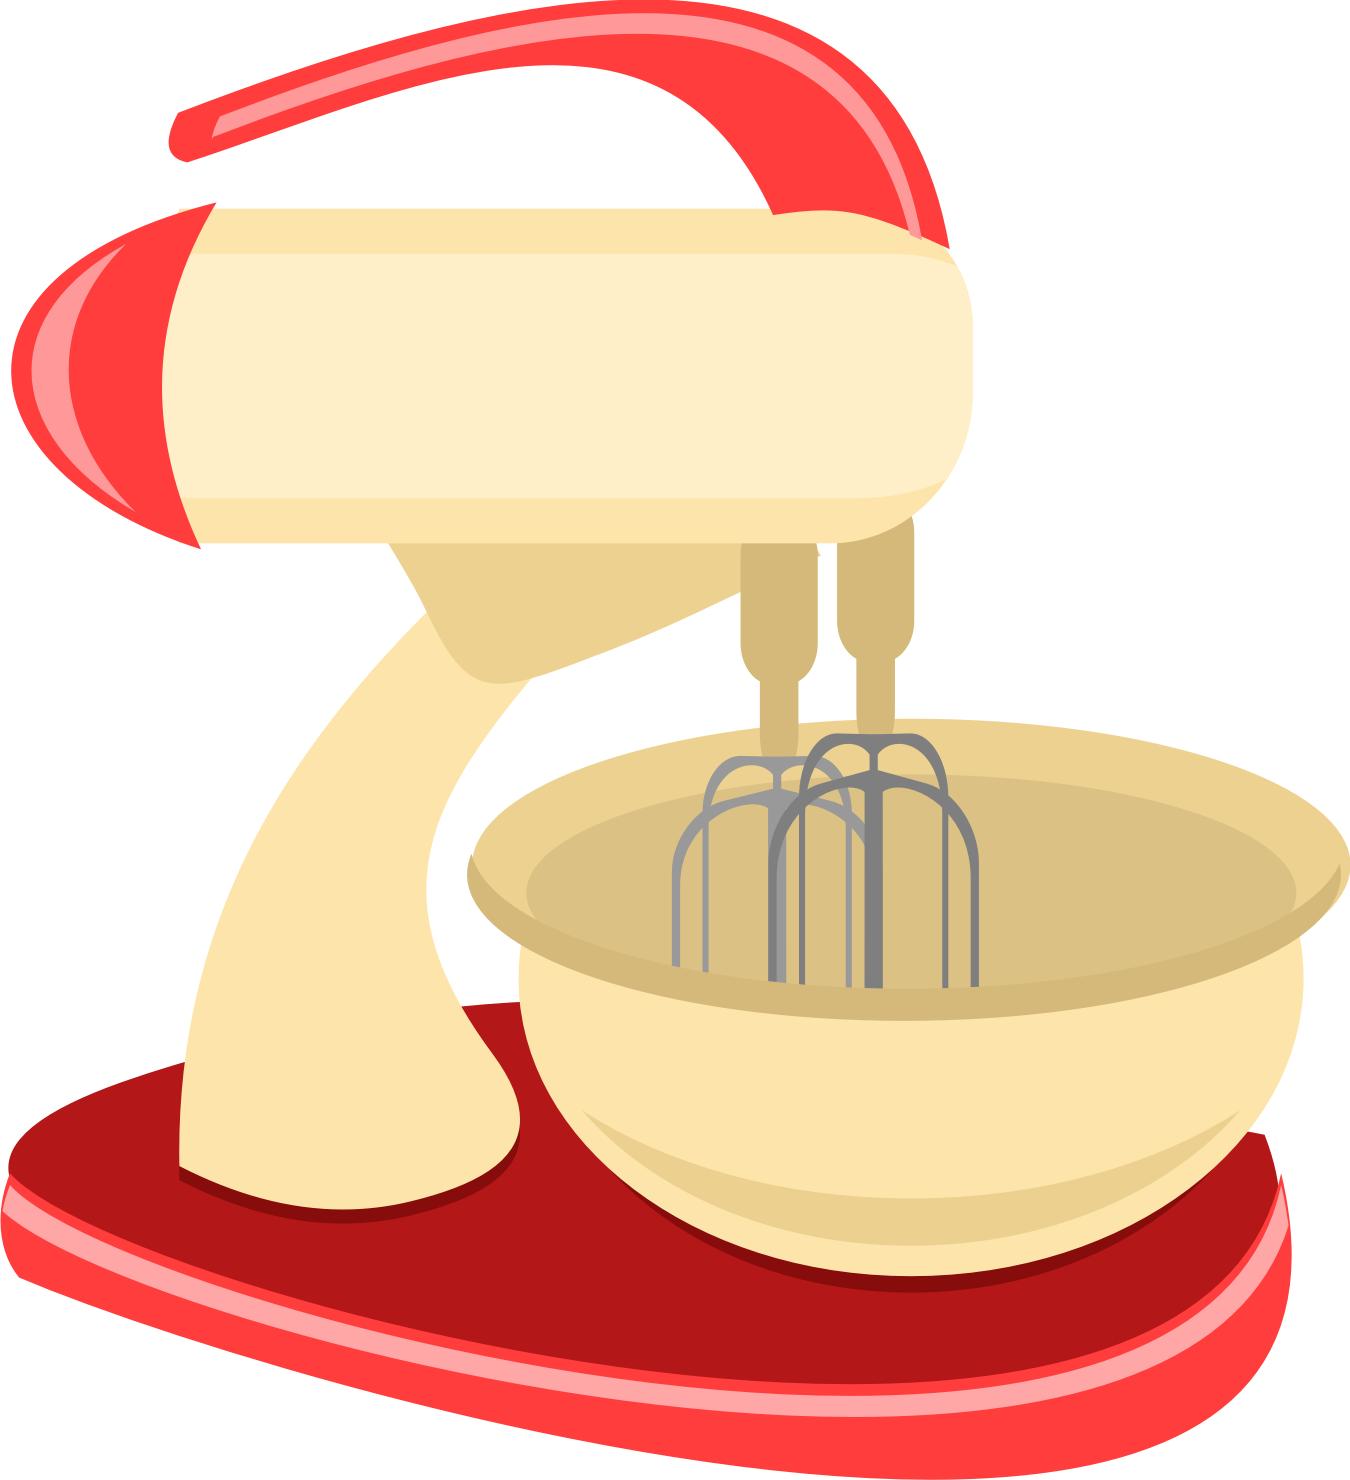 Cookbook clipart kitchen rules. Photo by danimfalcao minus